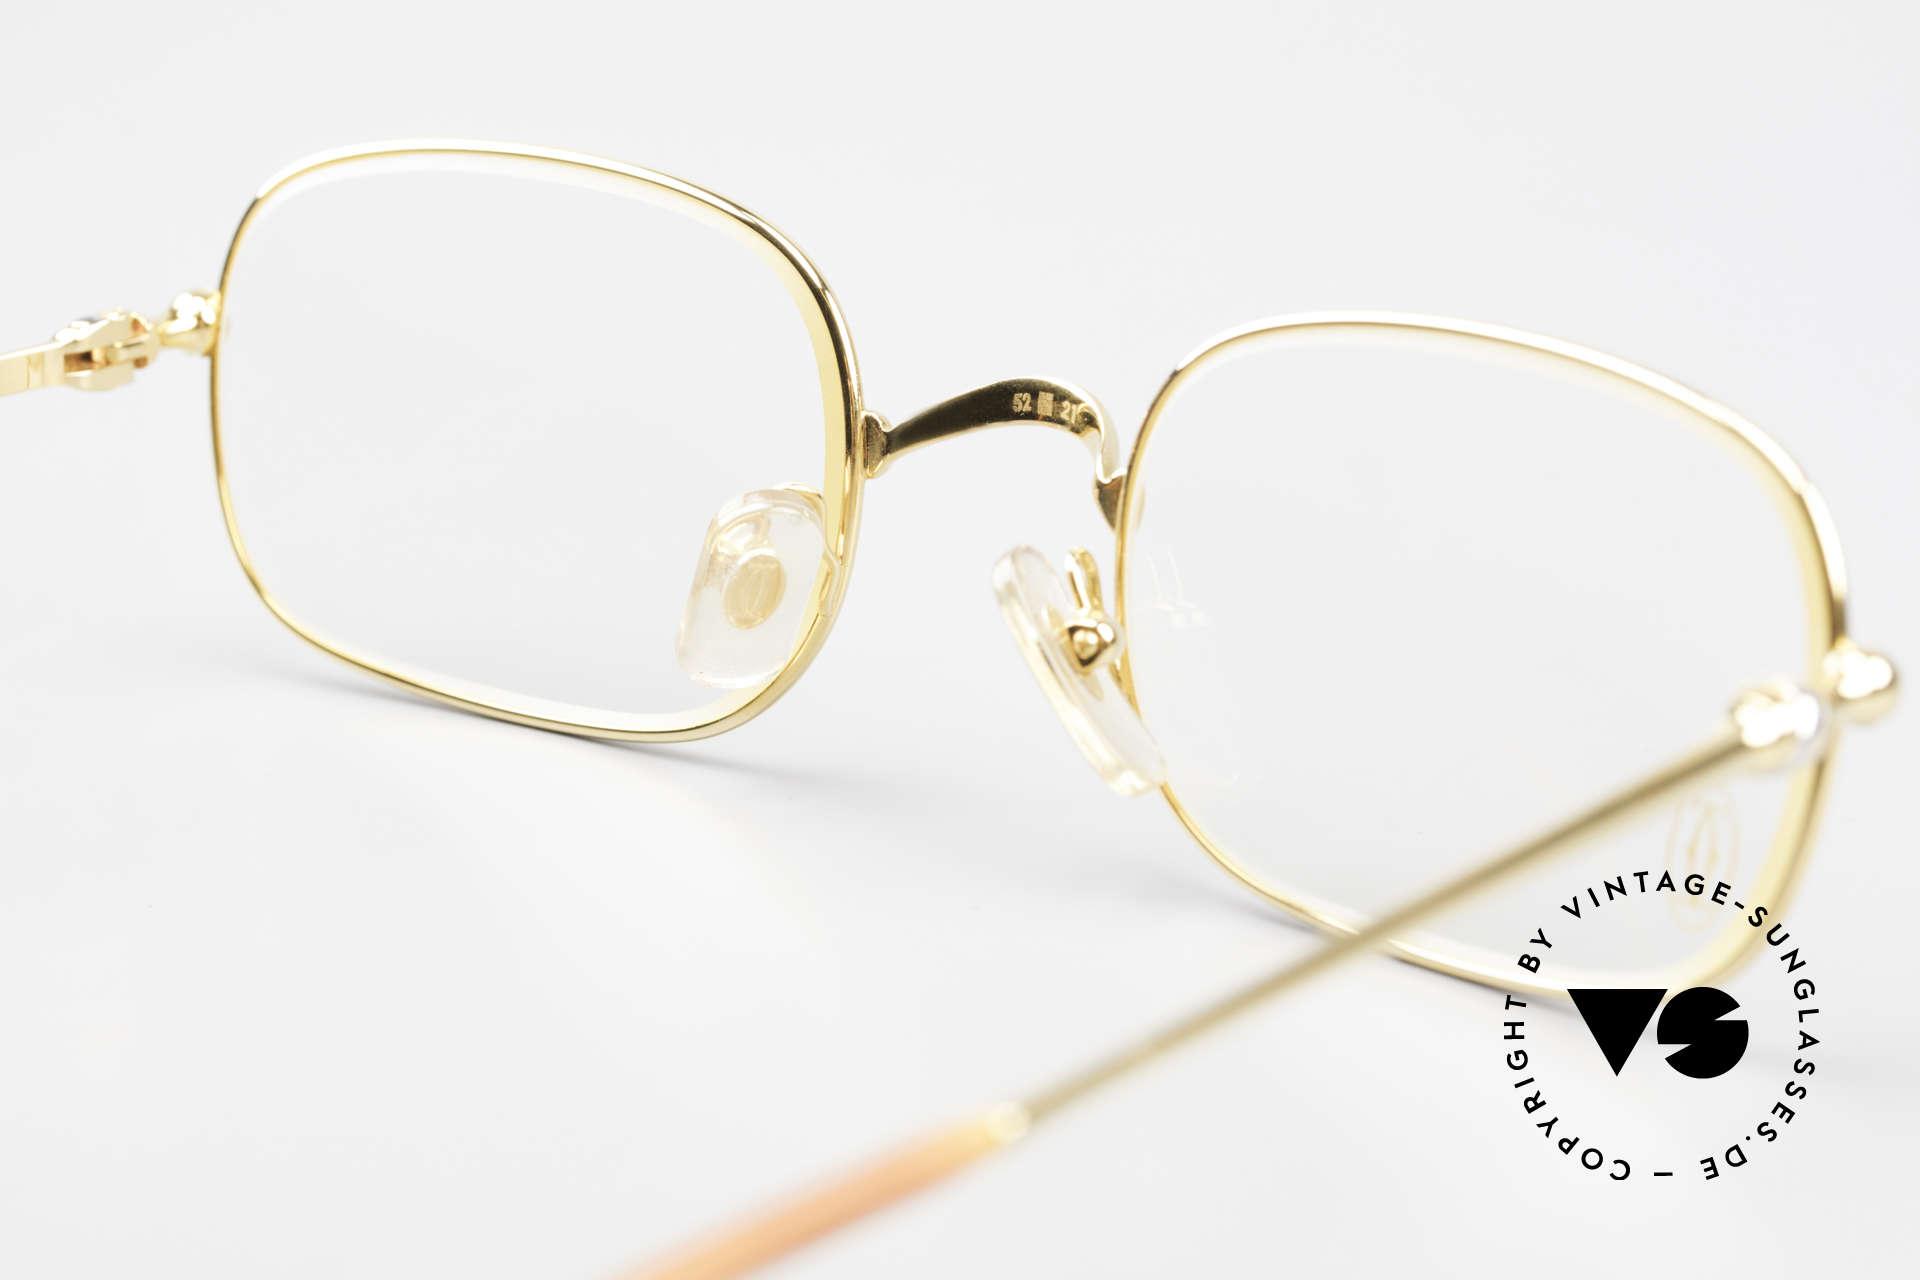 Cartier Deimios Rare Luxury Eyeglasses 90's, NO retro eyewear, but a 20 years old Cartier Original, Made for Men and Women